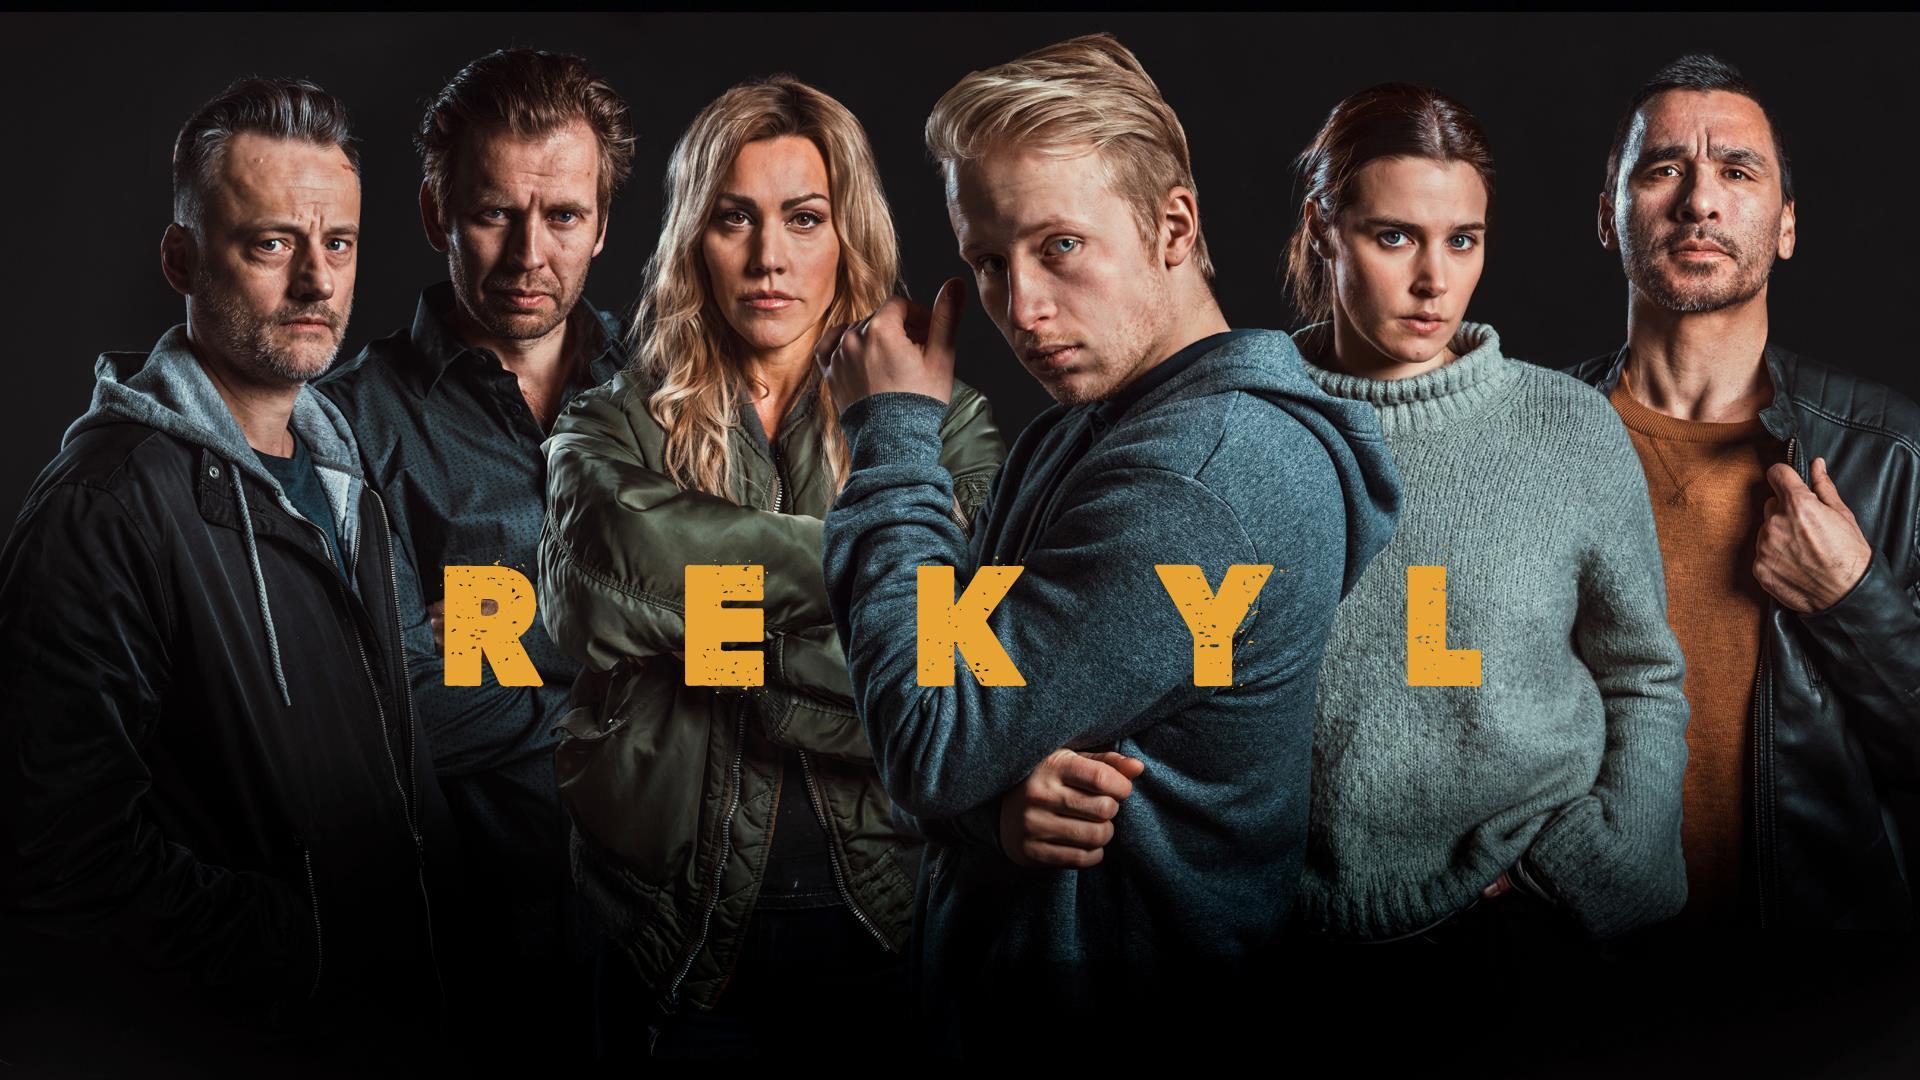 Rekyl/Recoil - premiere april, TV3/Viaplay